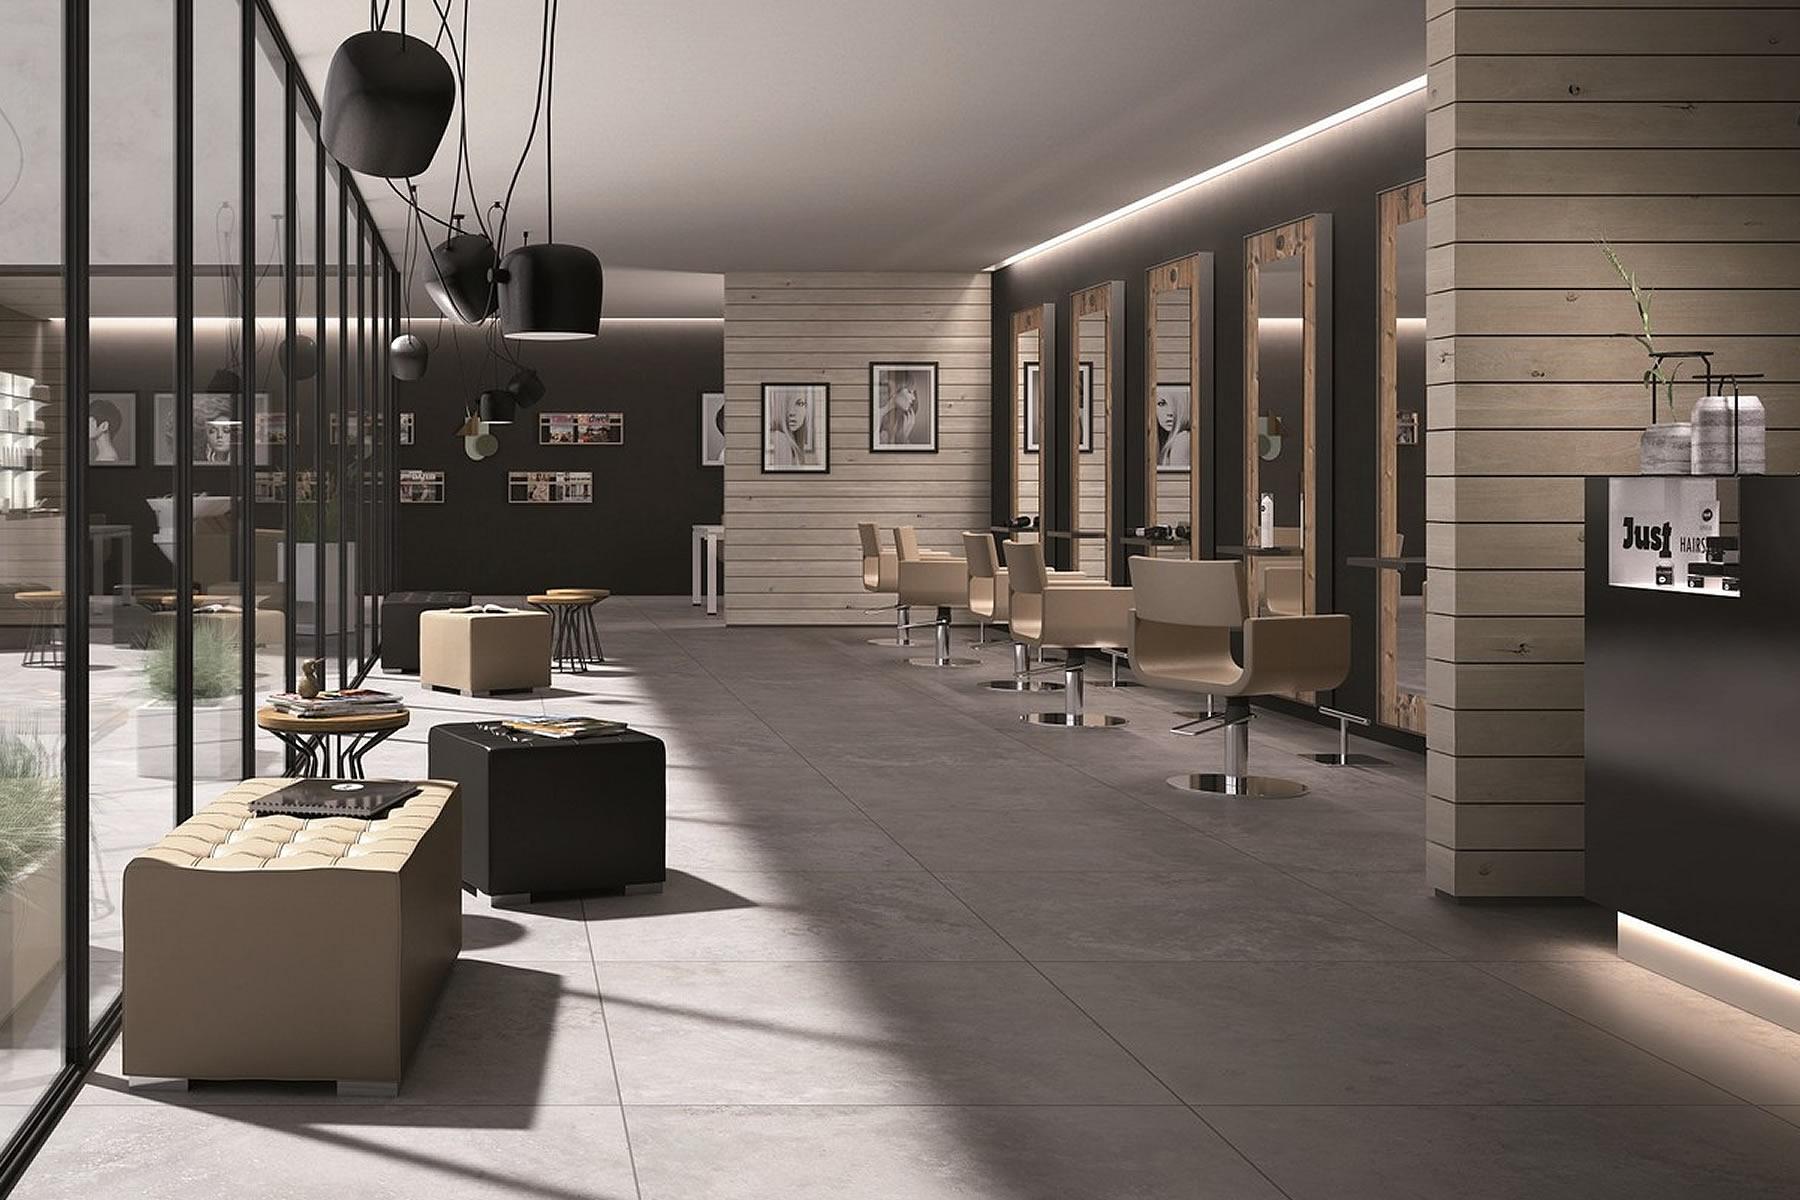 Idea arredo arredamento parrucchieri e centri estetitici for Muster arredamenti parrucchieri